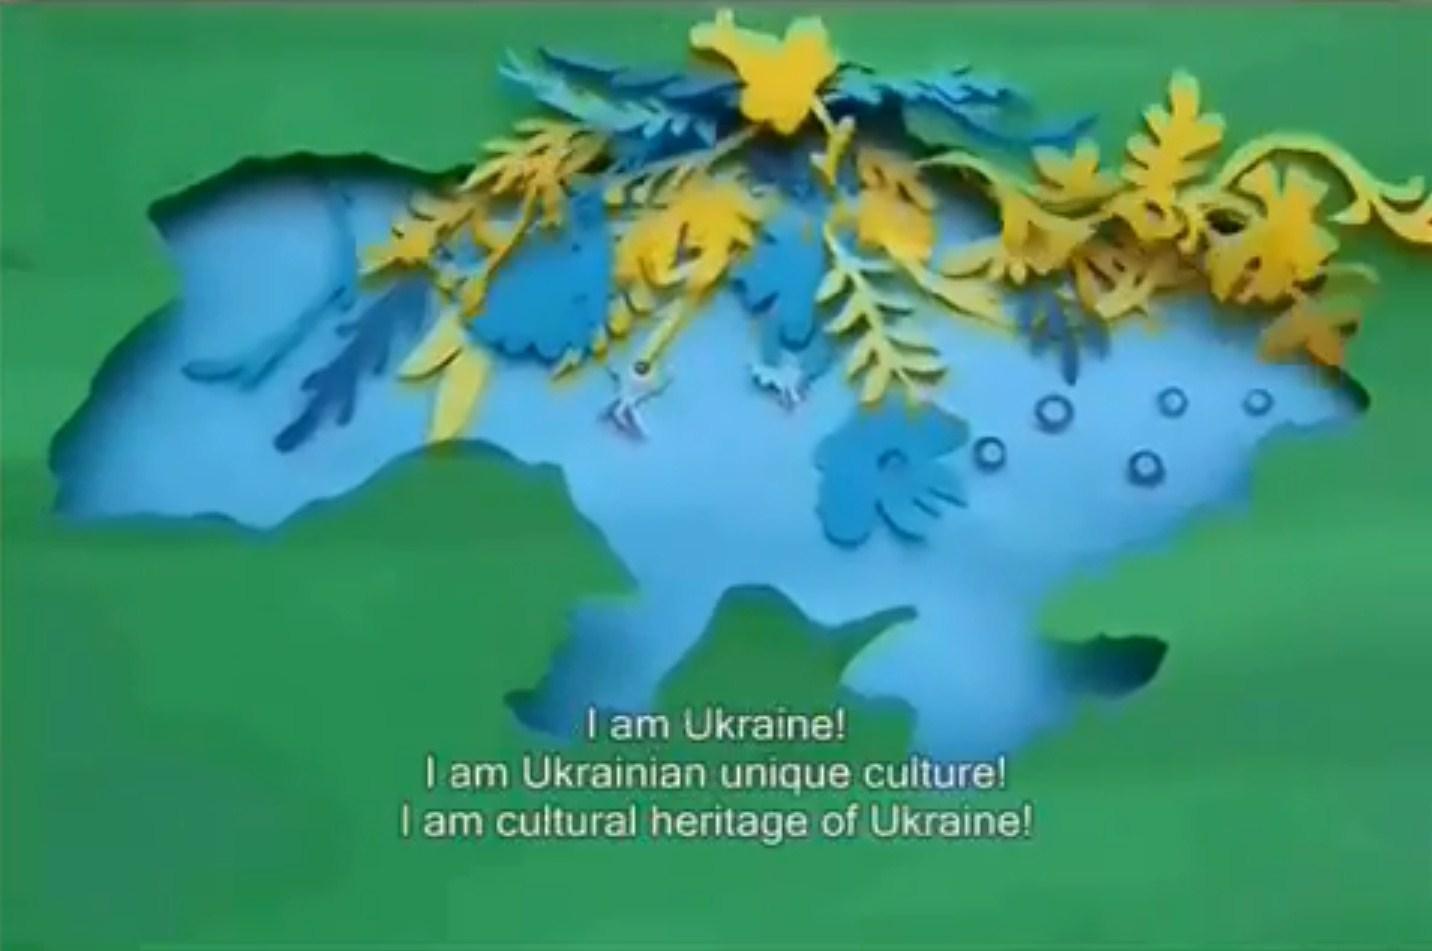 Культурна спадщина України. Cultural Heritage of Ukraine